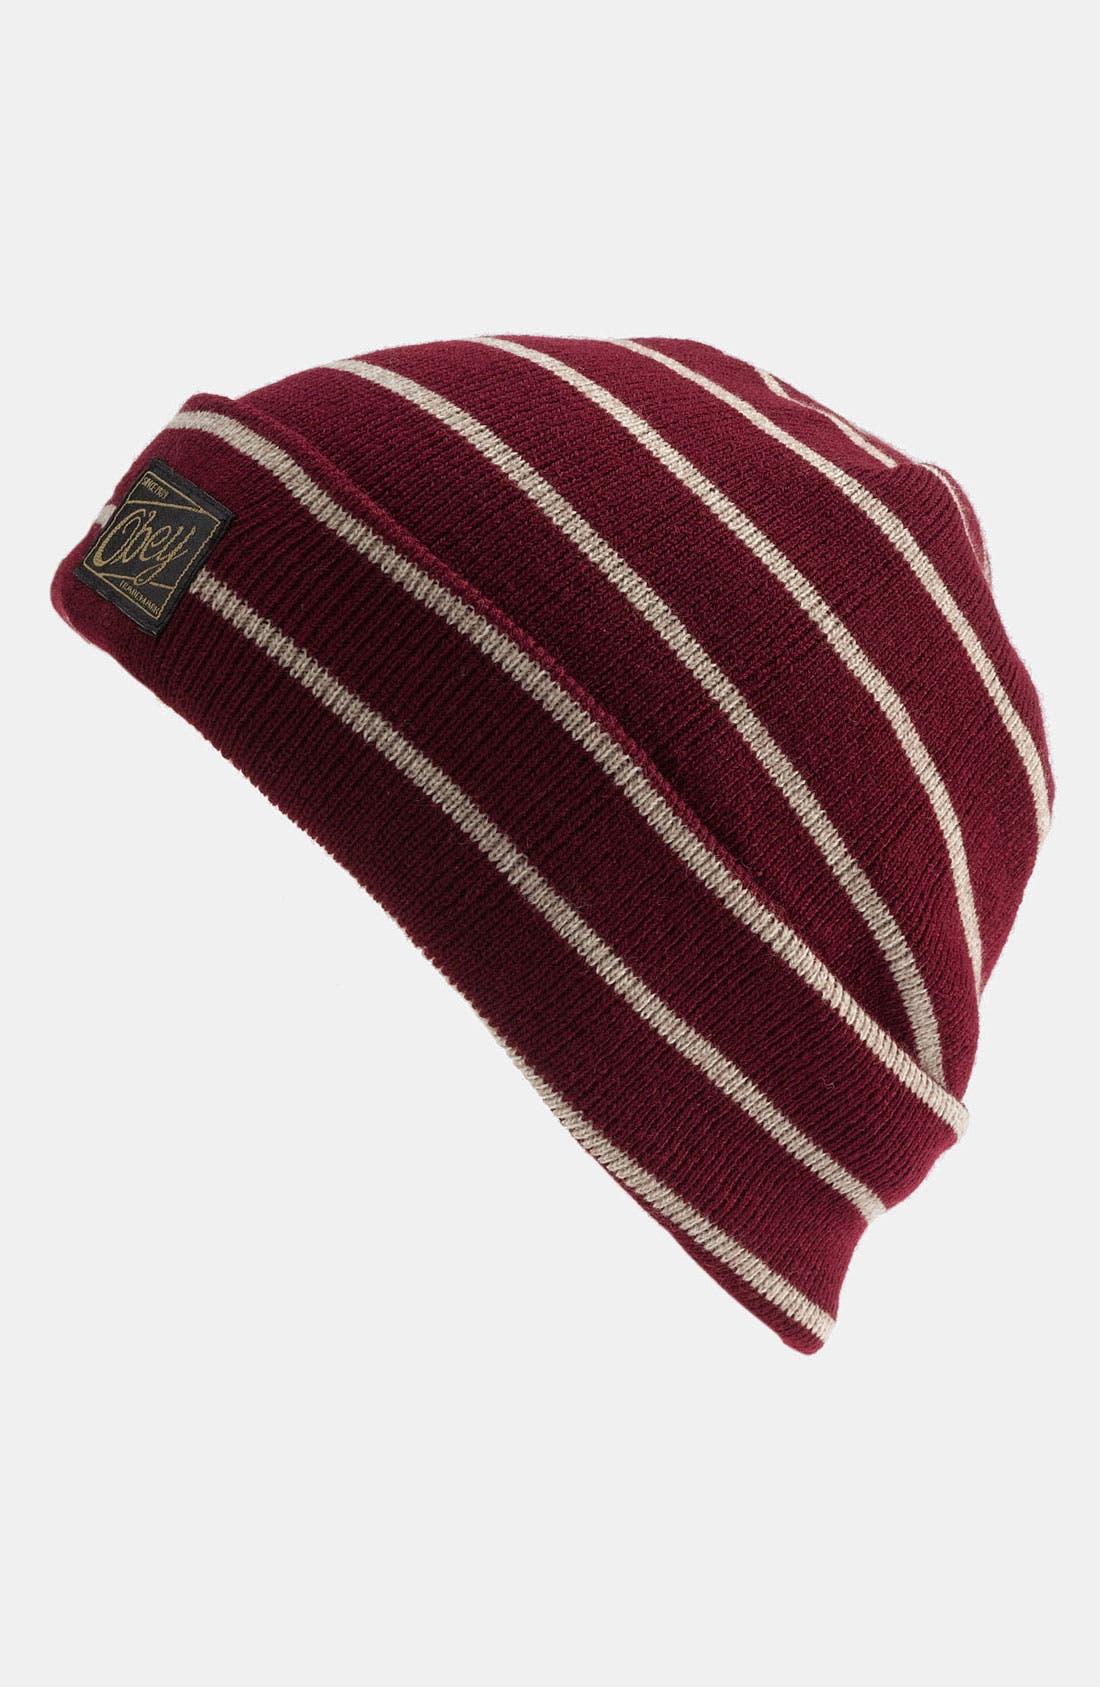 Main Image - Obey 'Jobber' Knit Cap